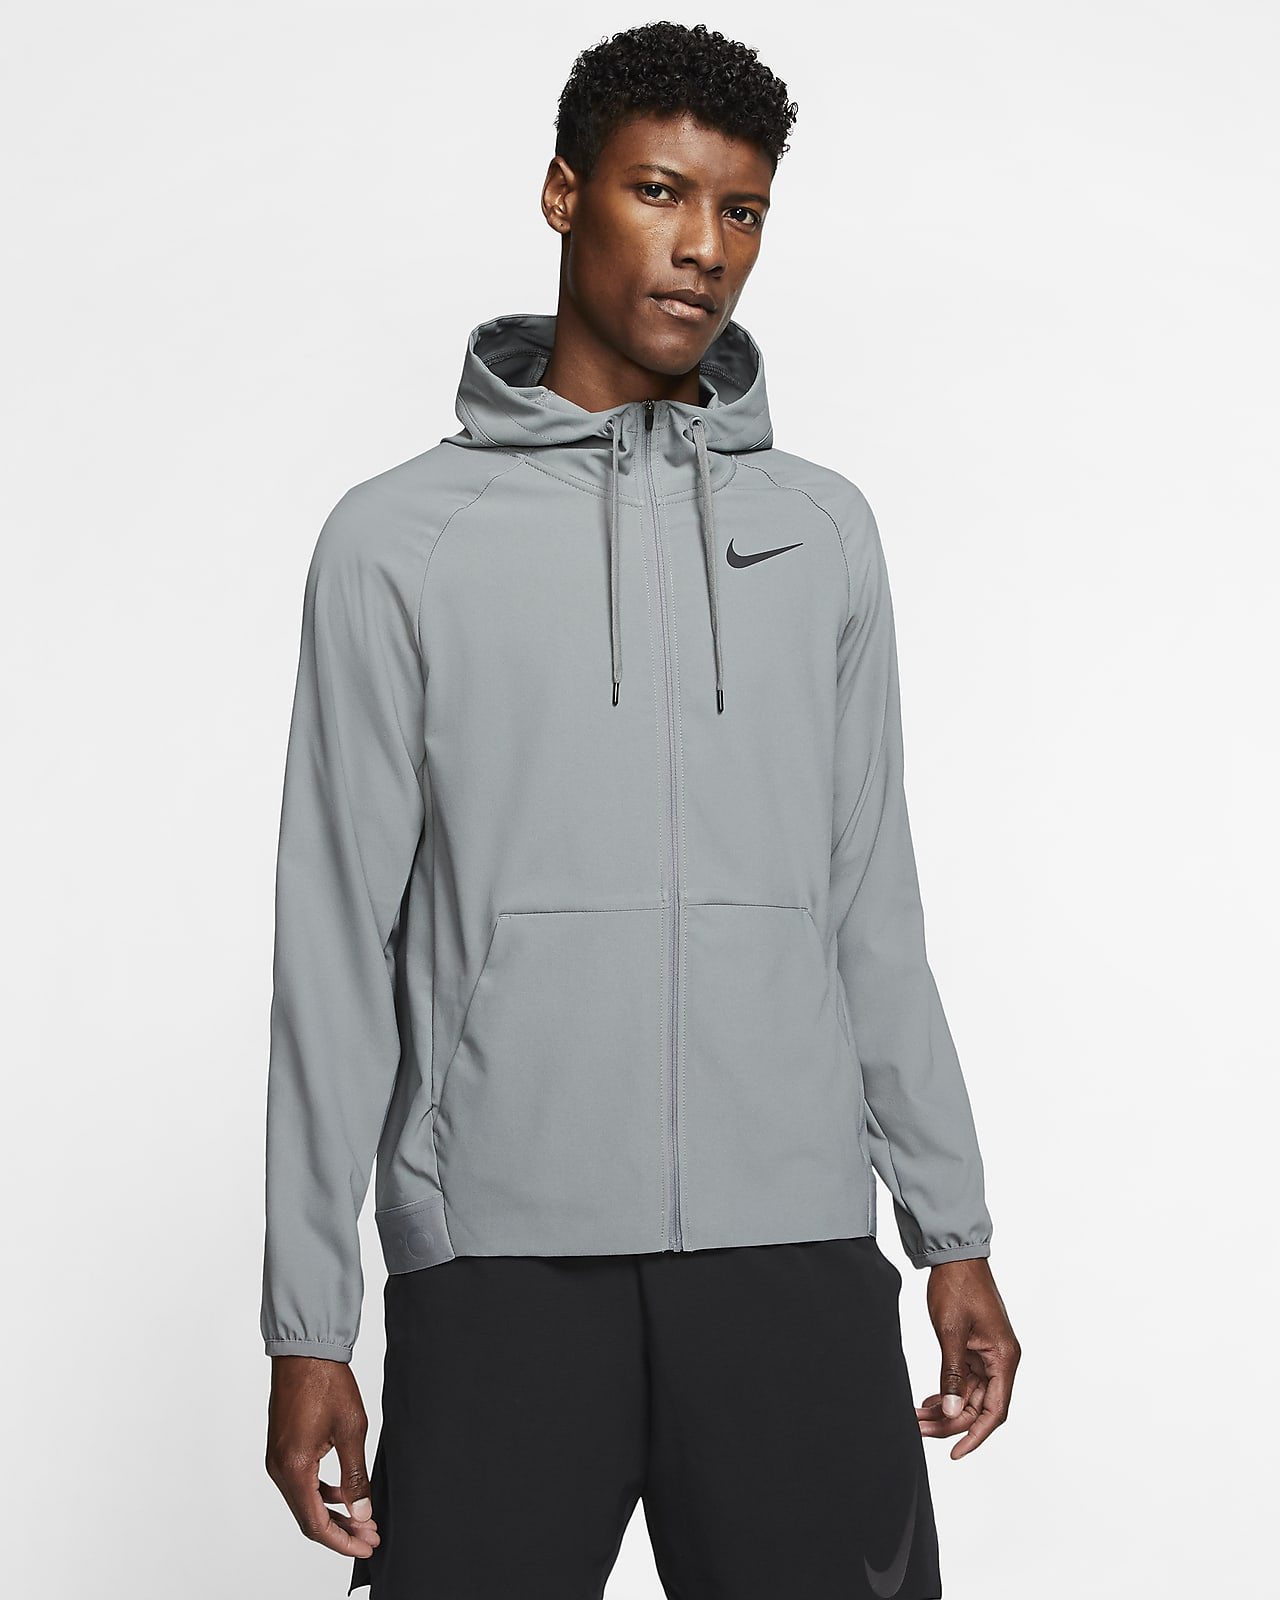 Nike Flex Trainingsjack met rits voor heren